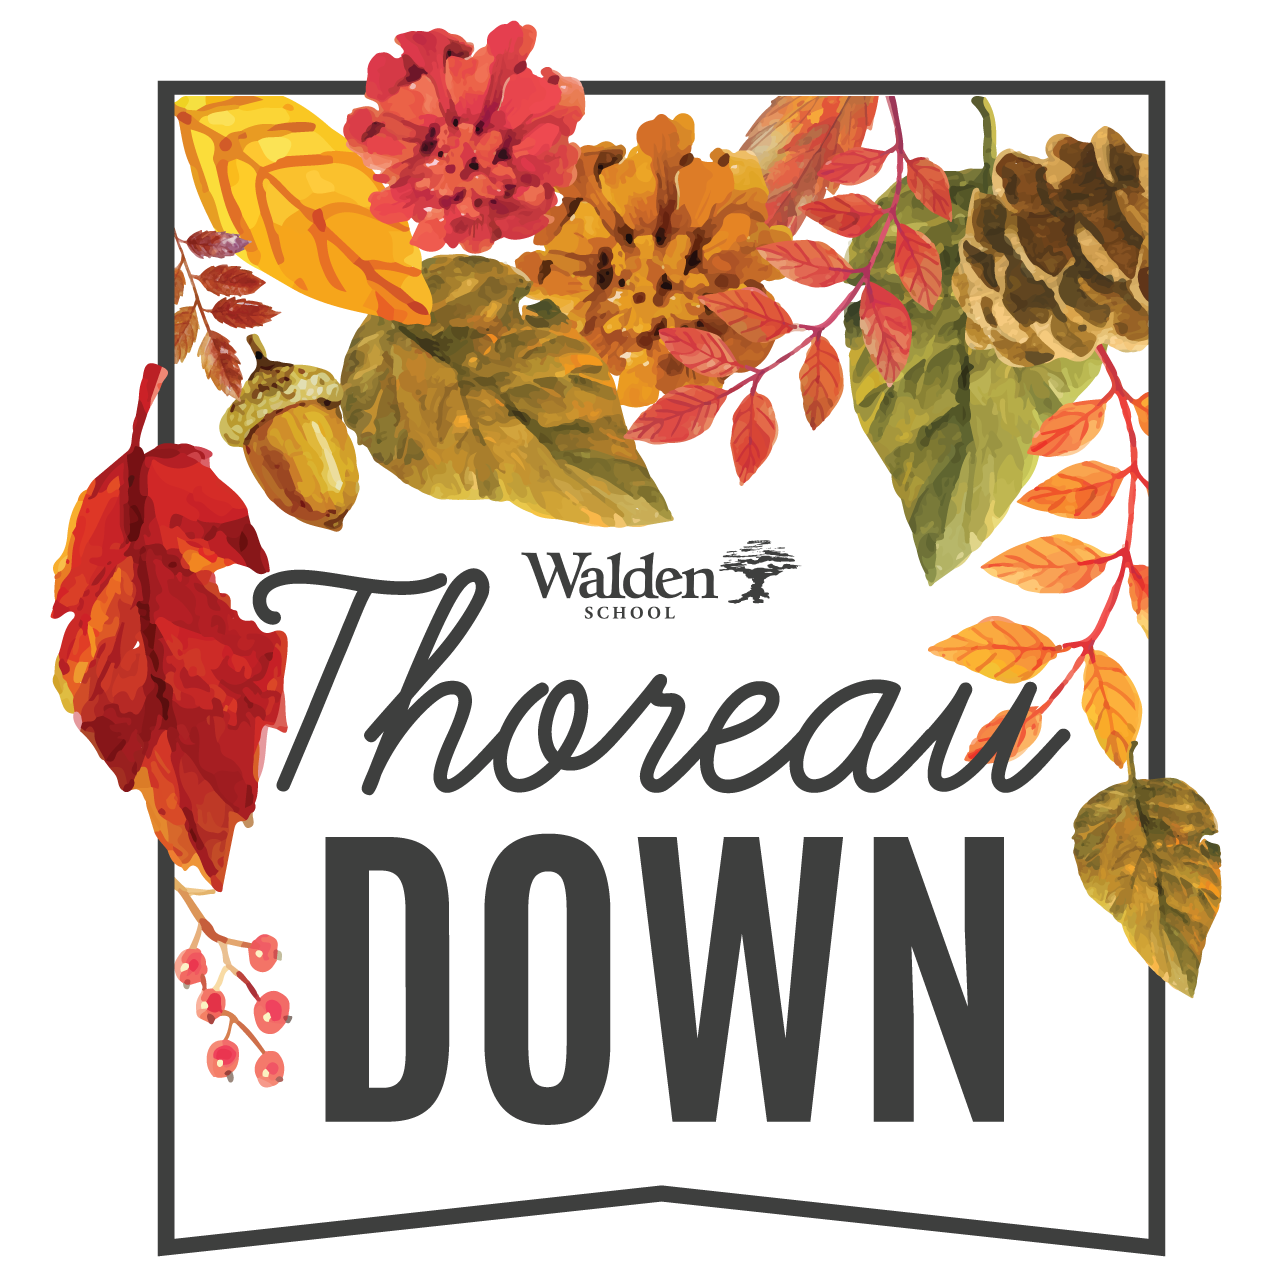 Digital_Thoreau-Down-2019_logo_transparent-background.png